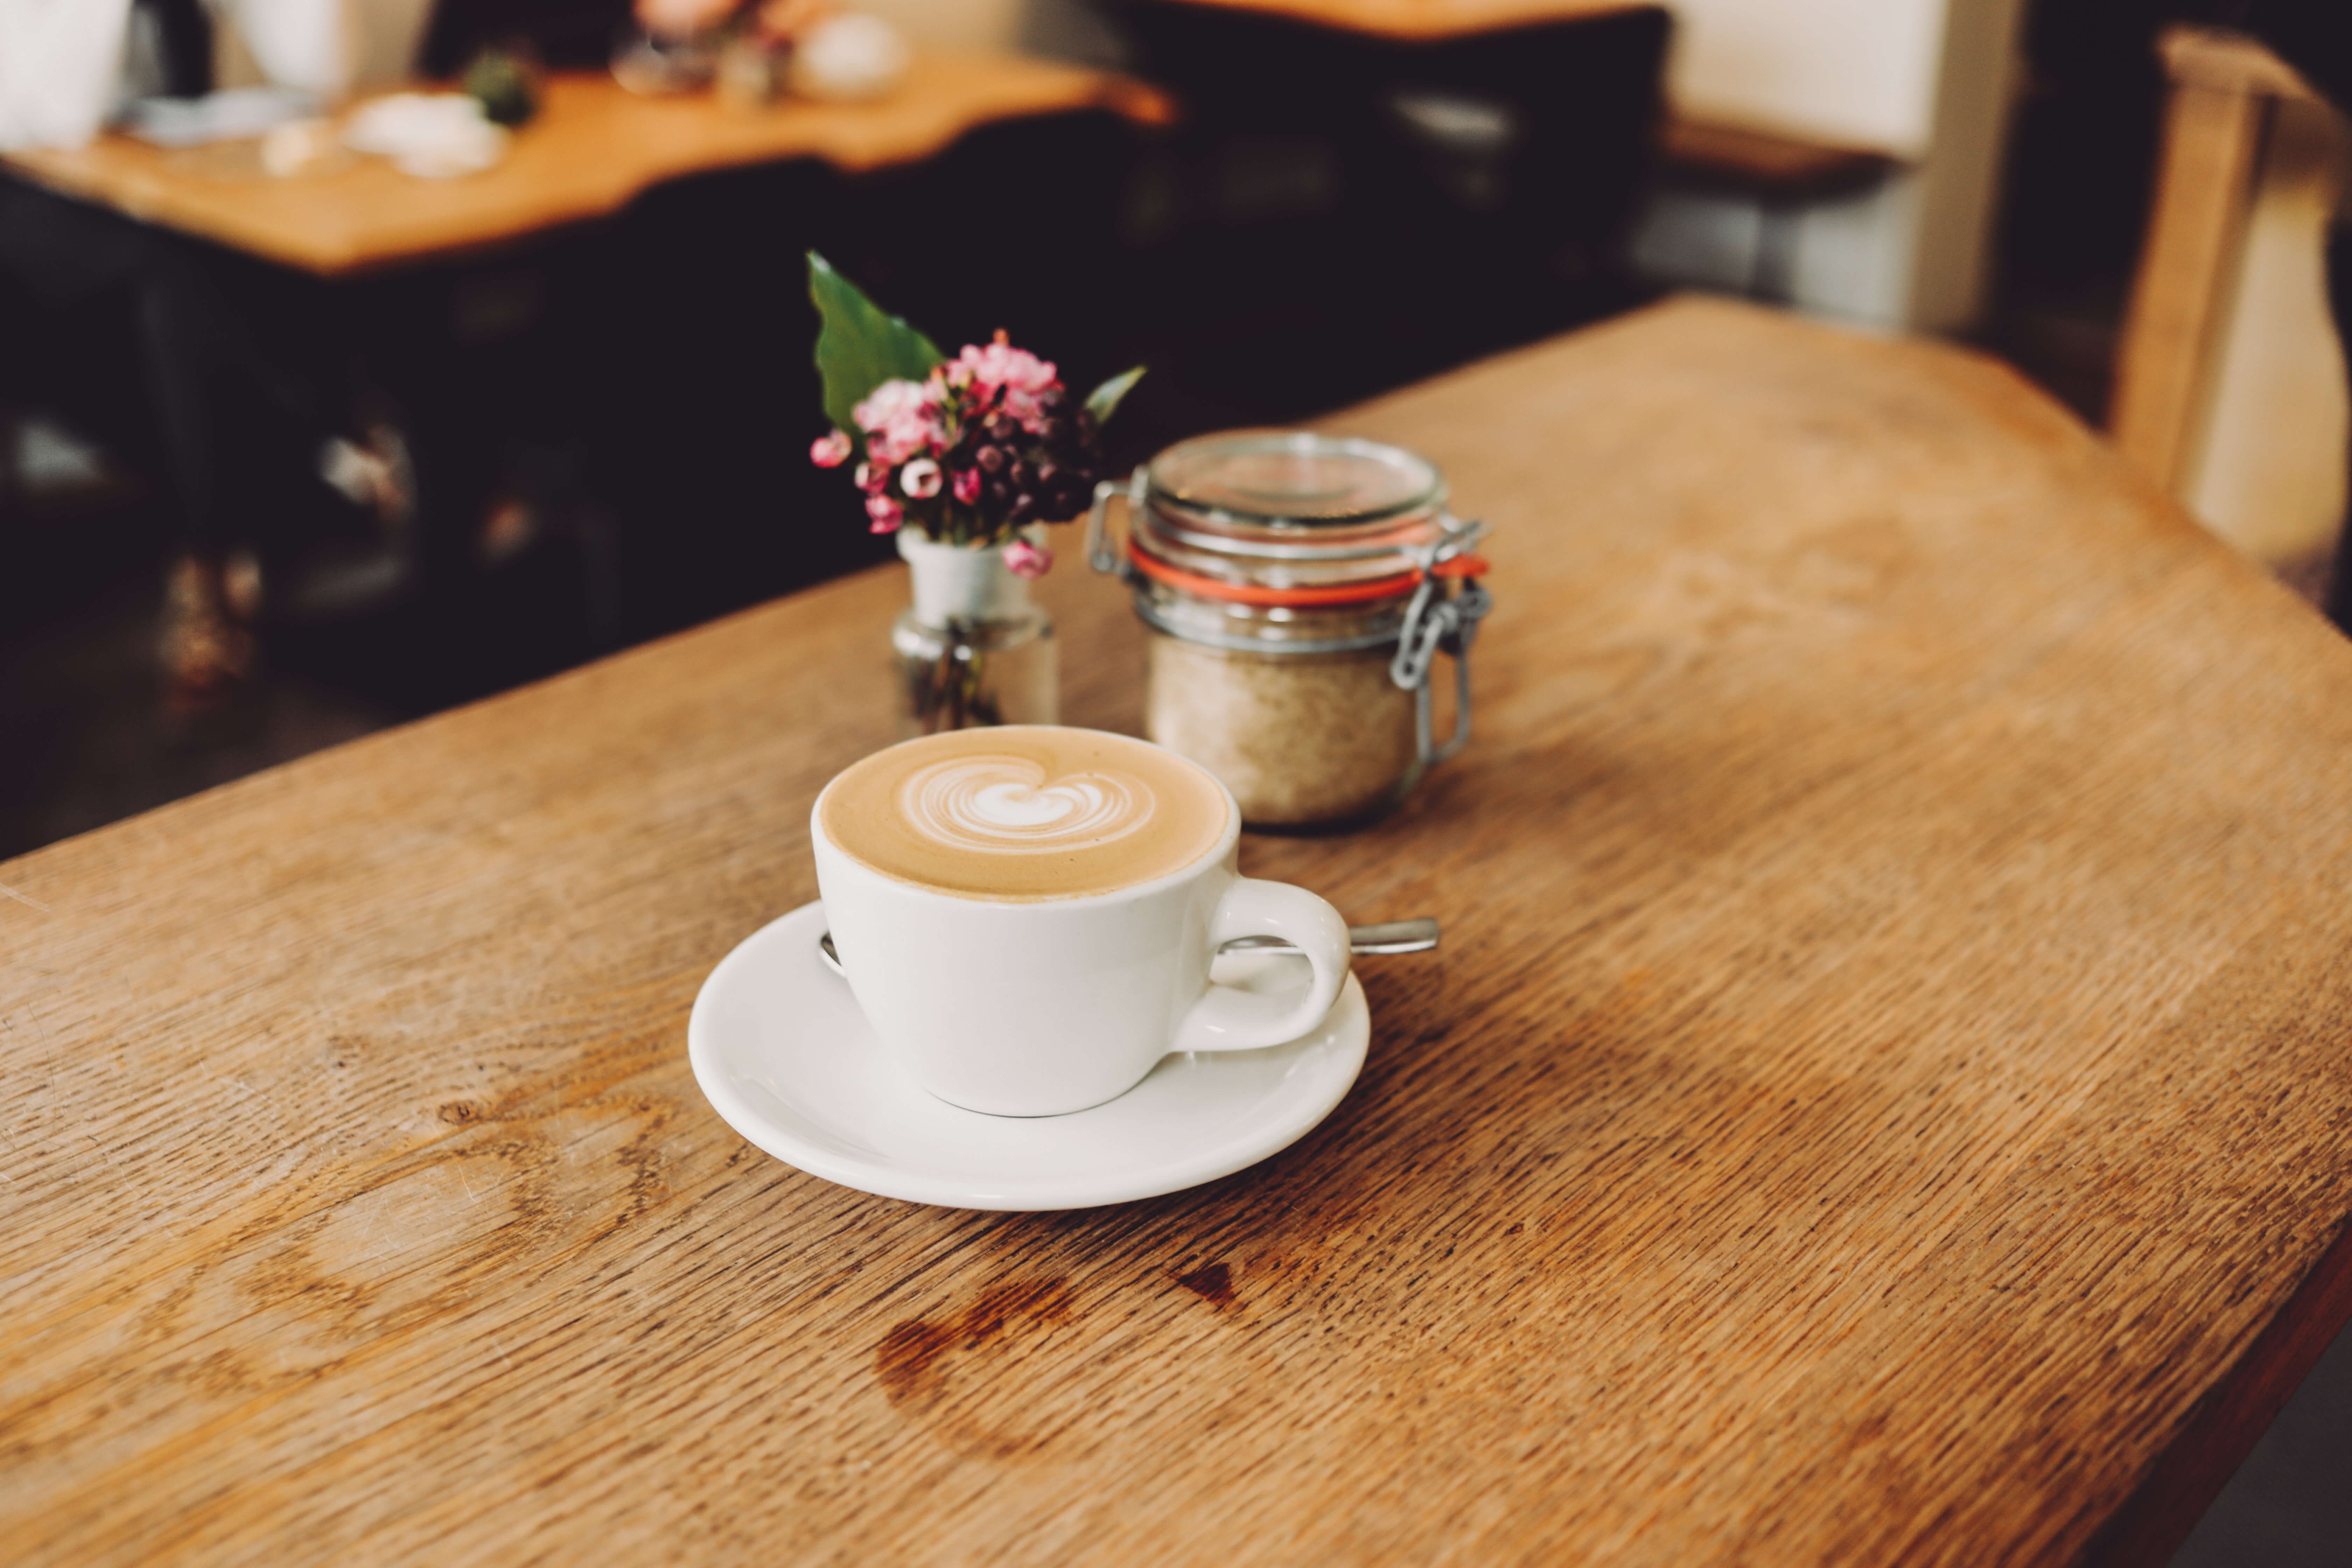 Morgen Cappuccino